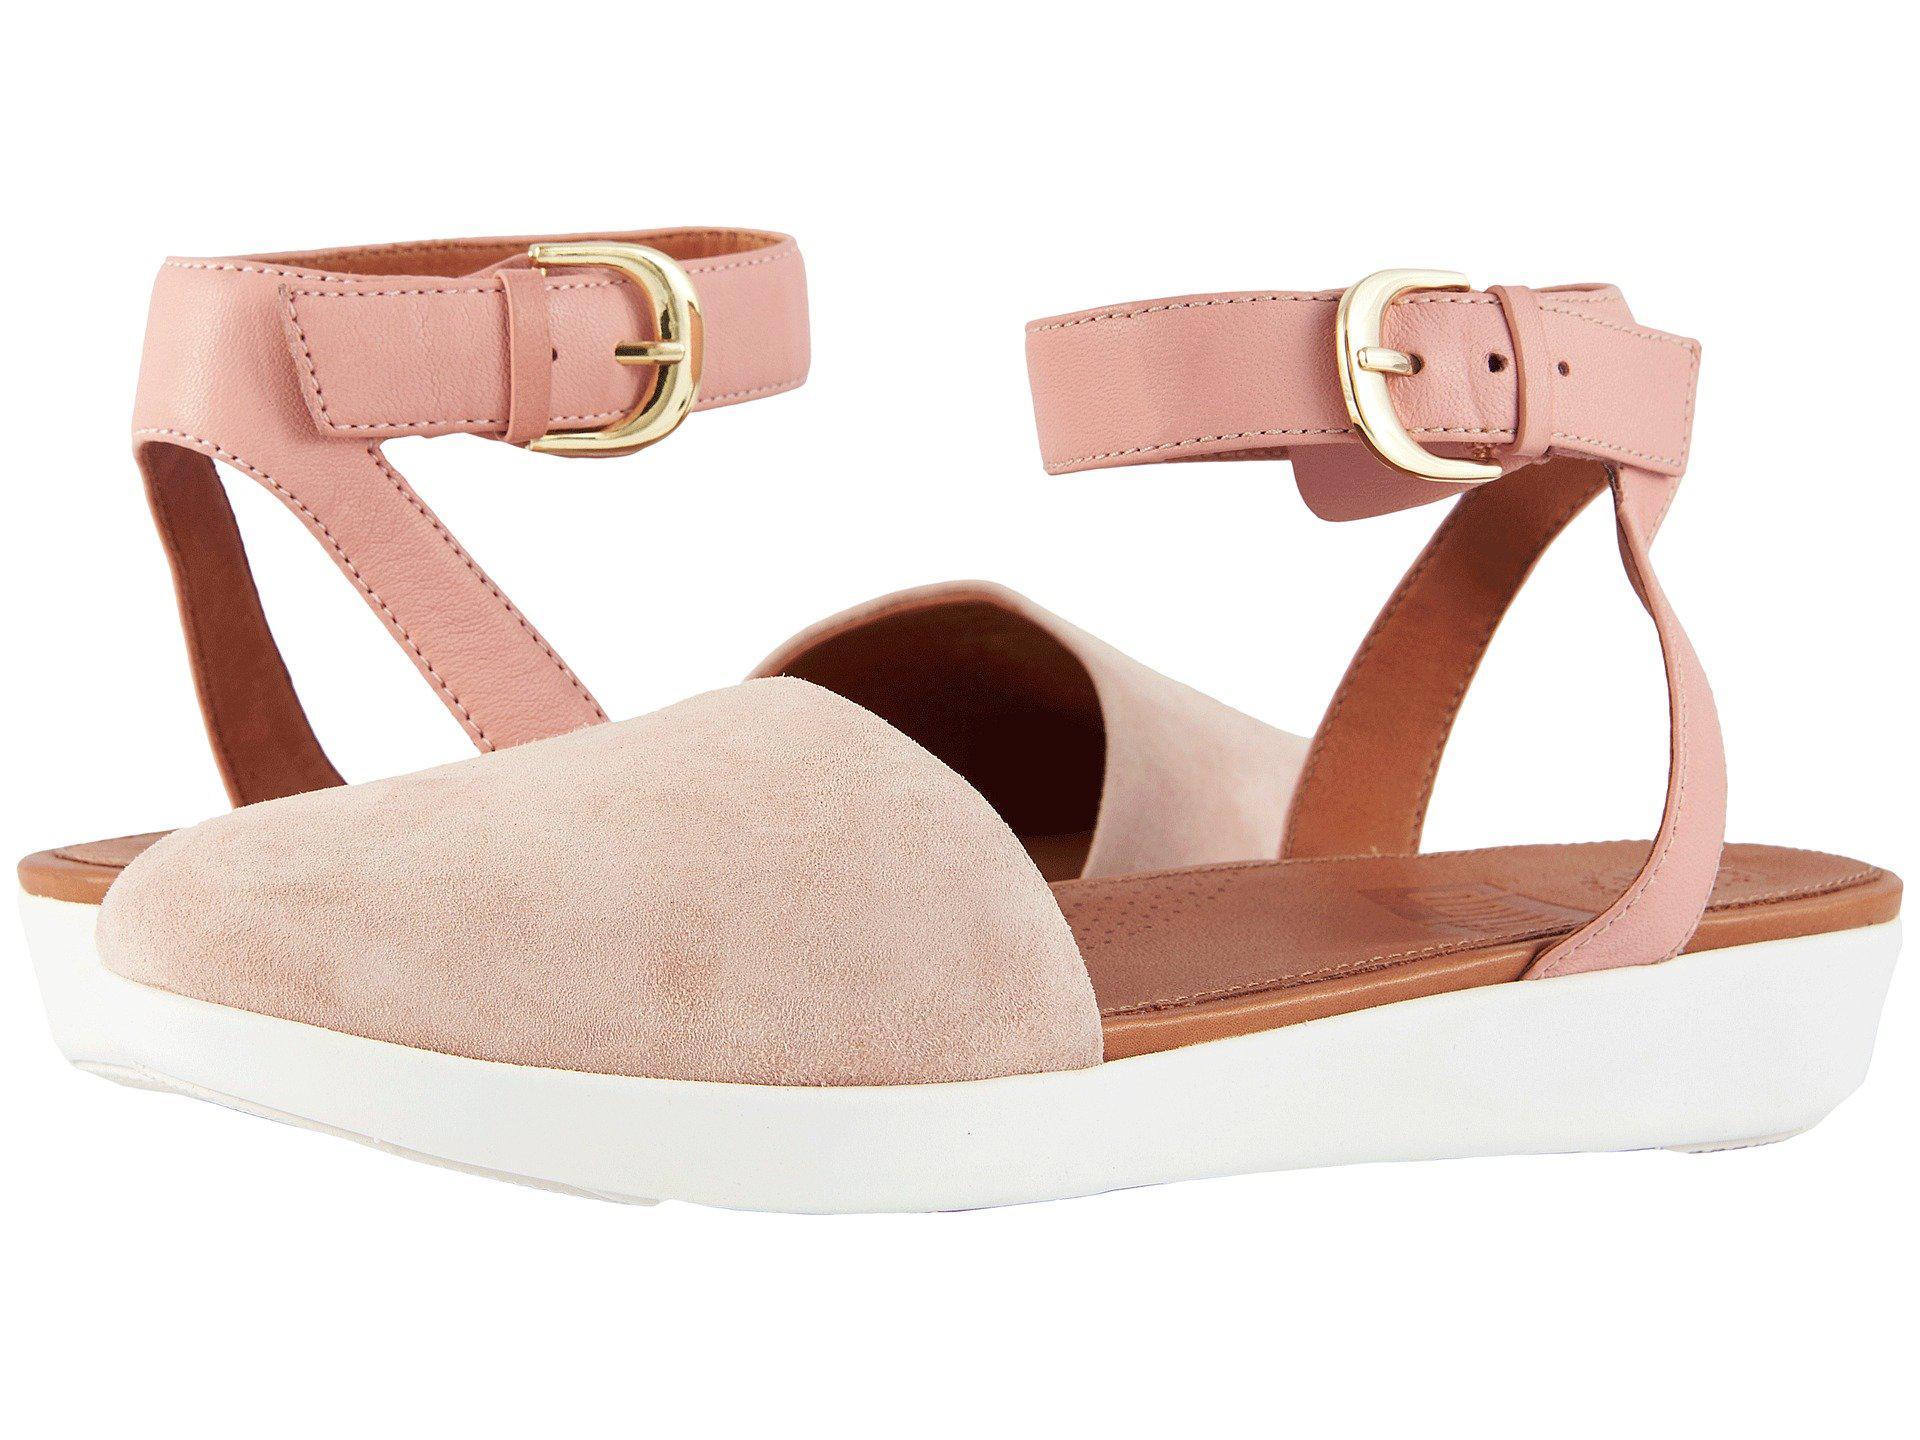 6145c53b07e Lyst - Fitflop Cova Closed Toe Sandals in Pink